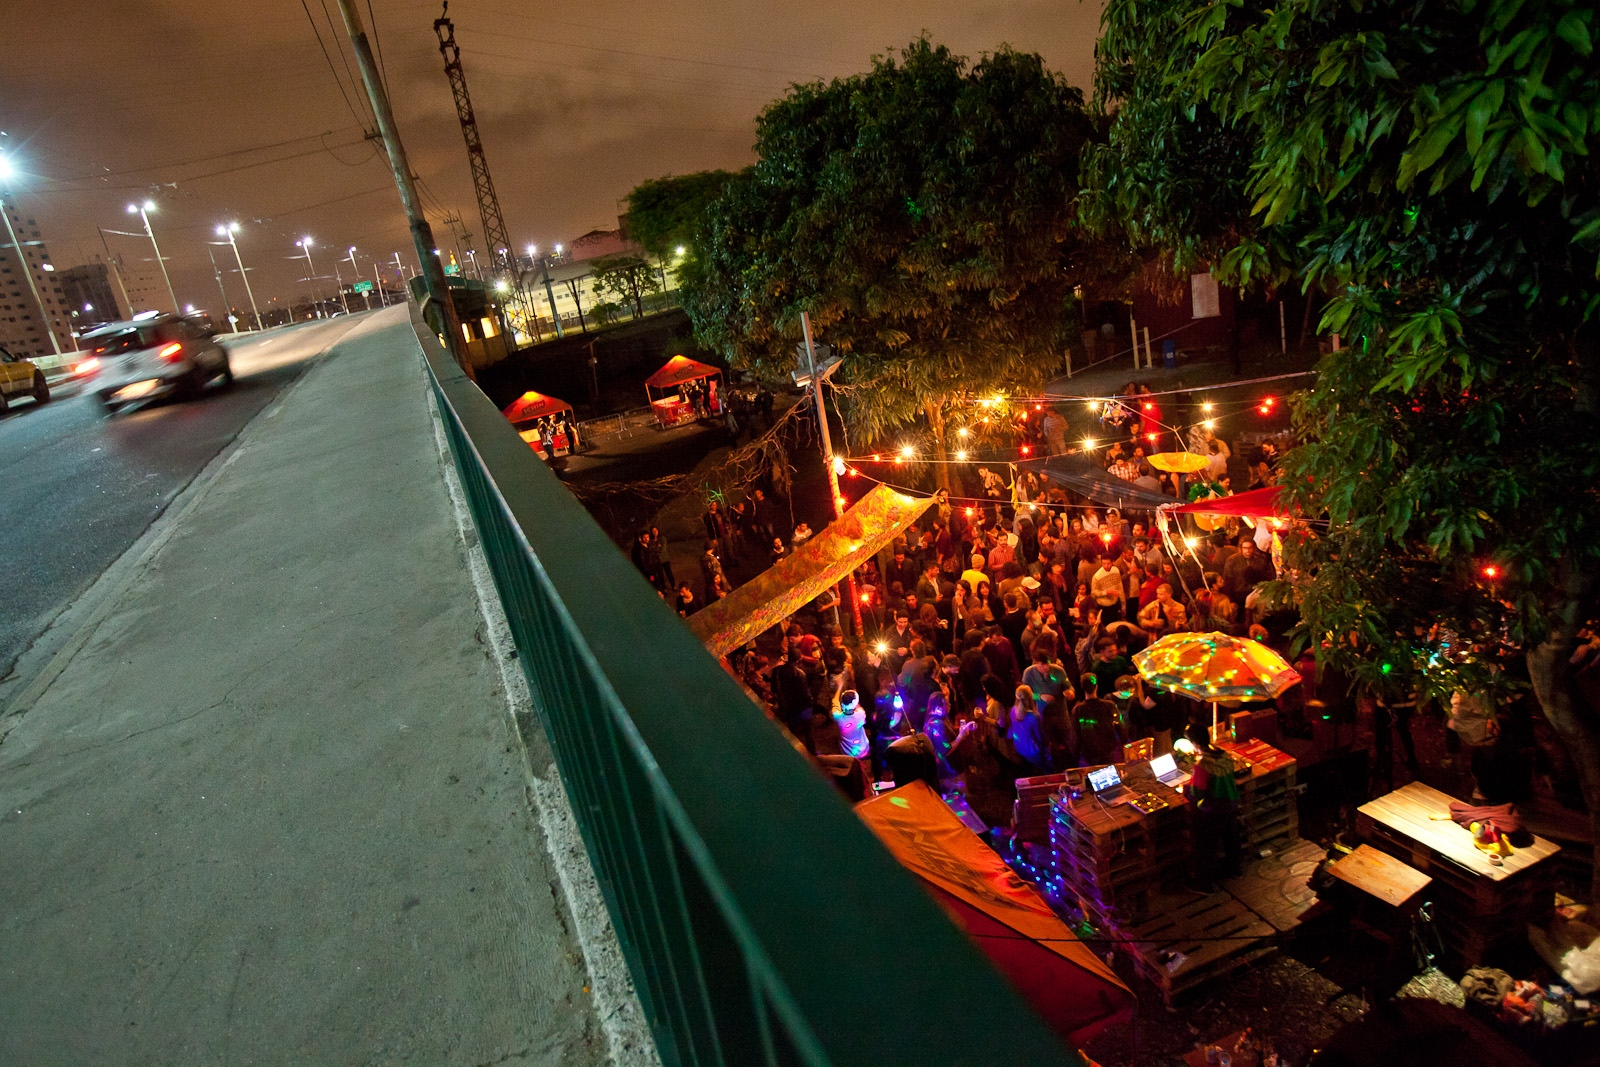 Festa em trilhos na Mooca / Party in rails in Mooca